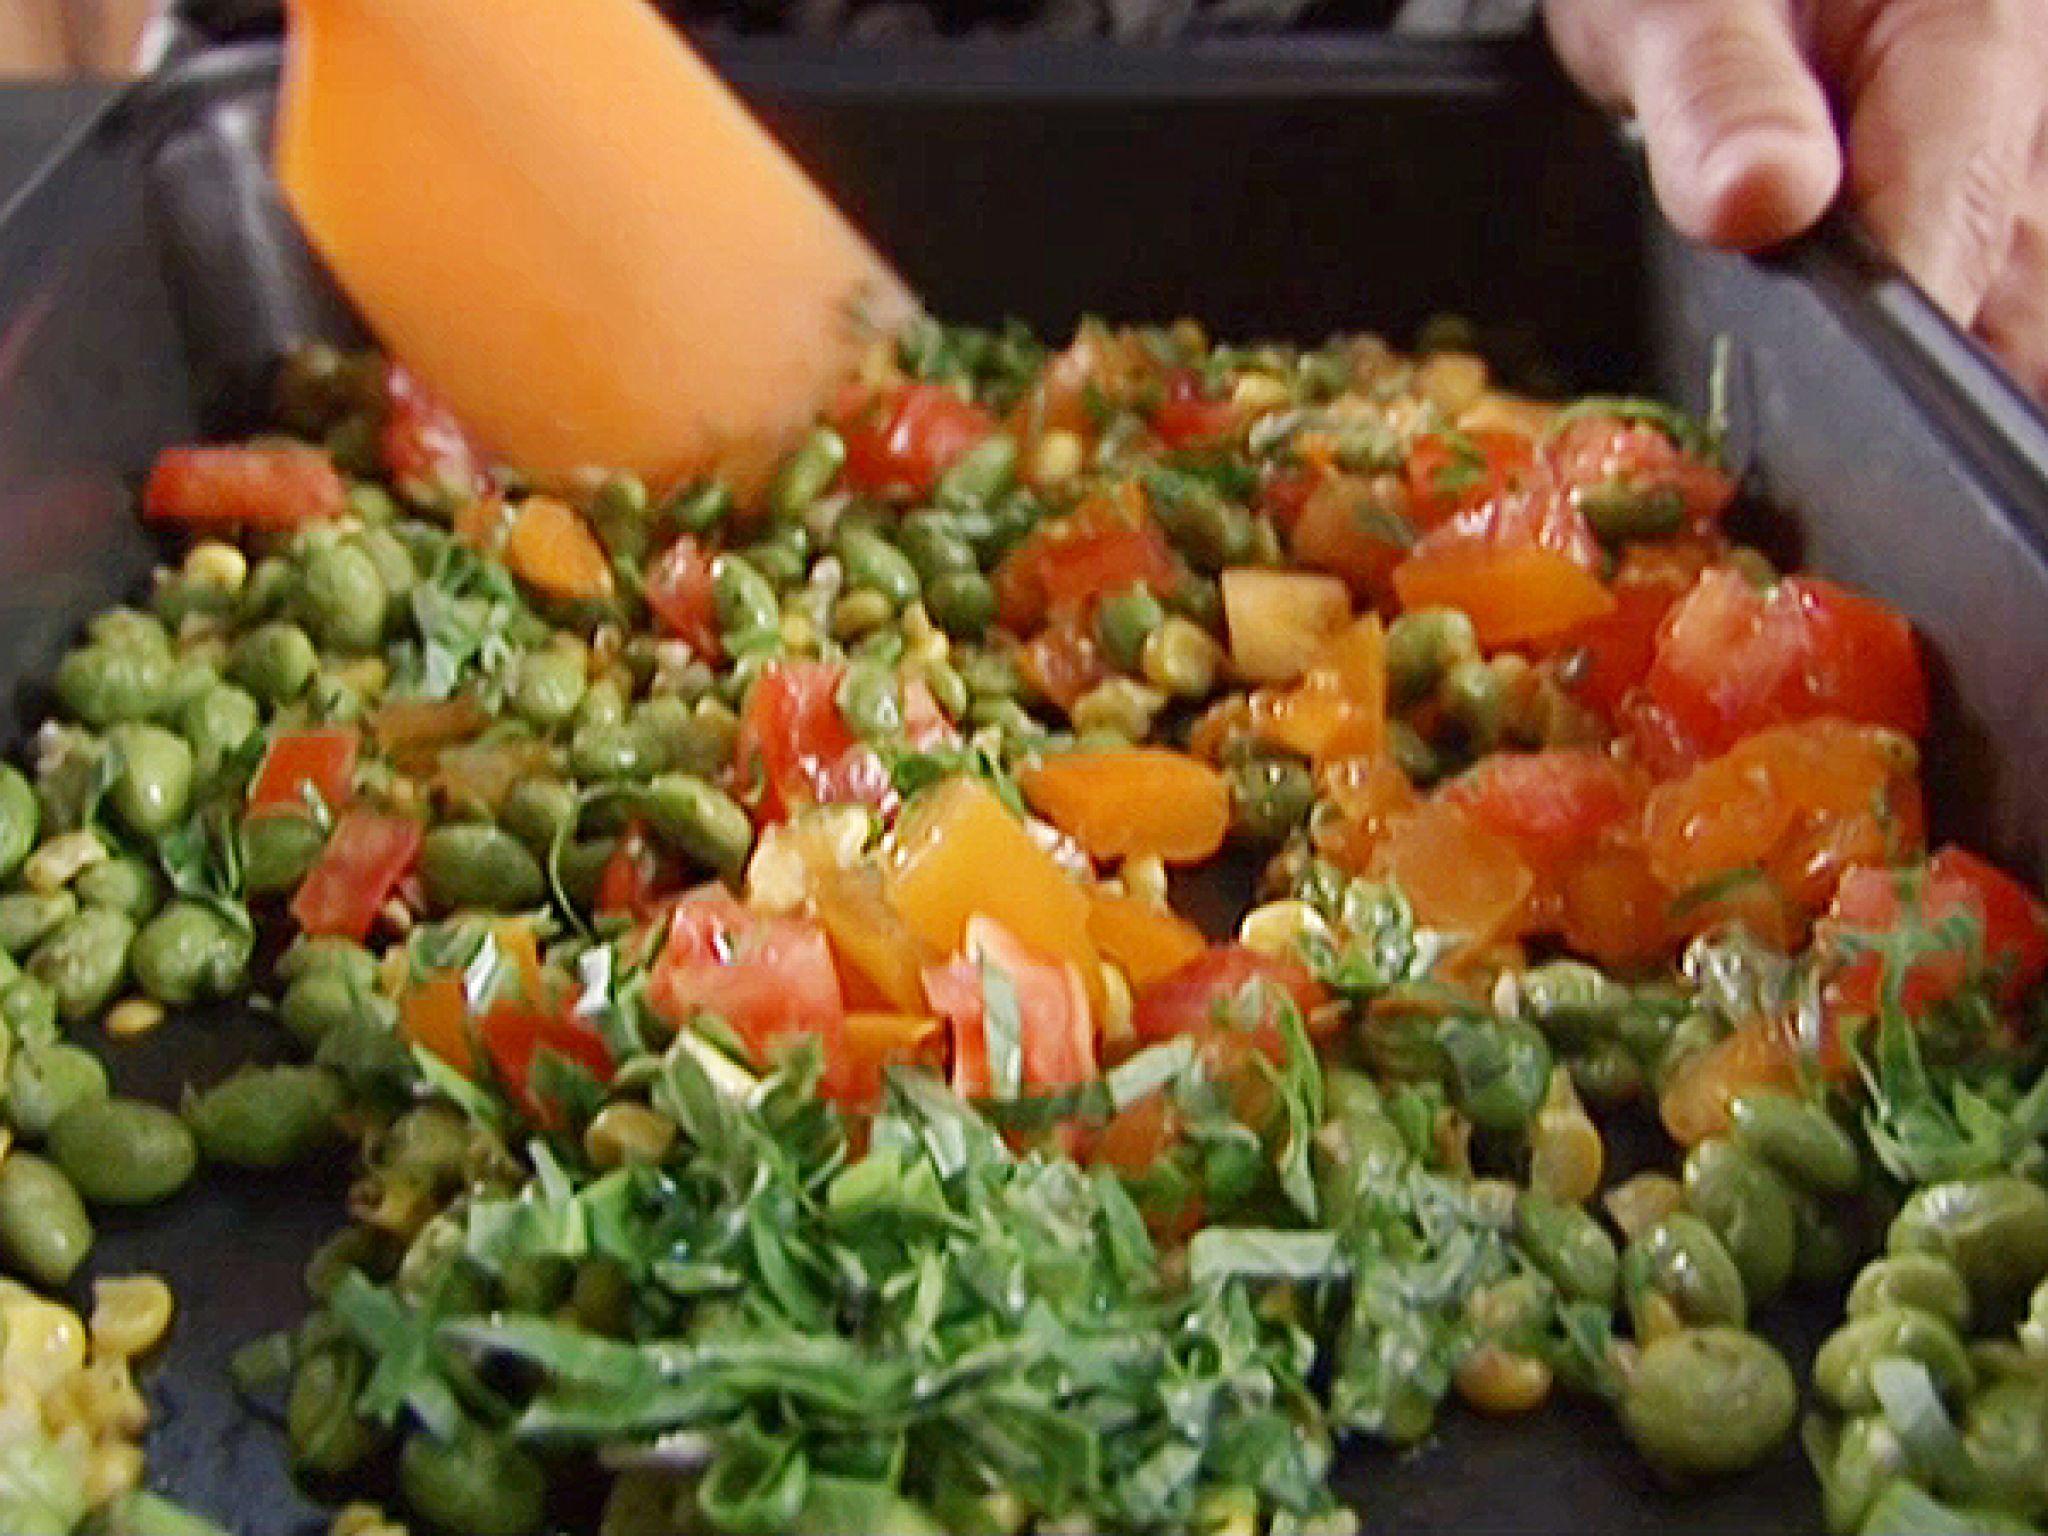 Roasted edamame salad recipe edamame salad edamame and salad forumfinder Image collections